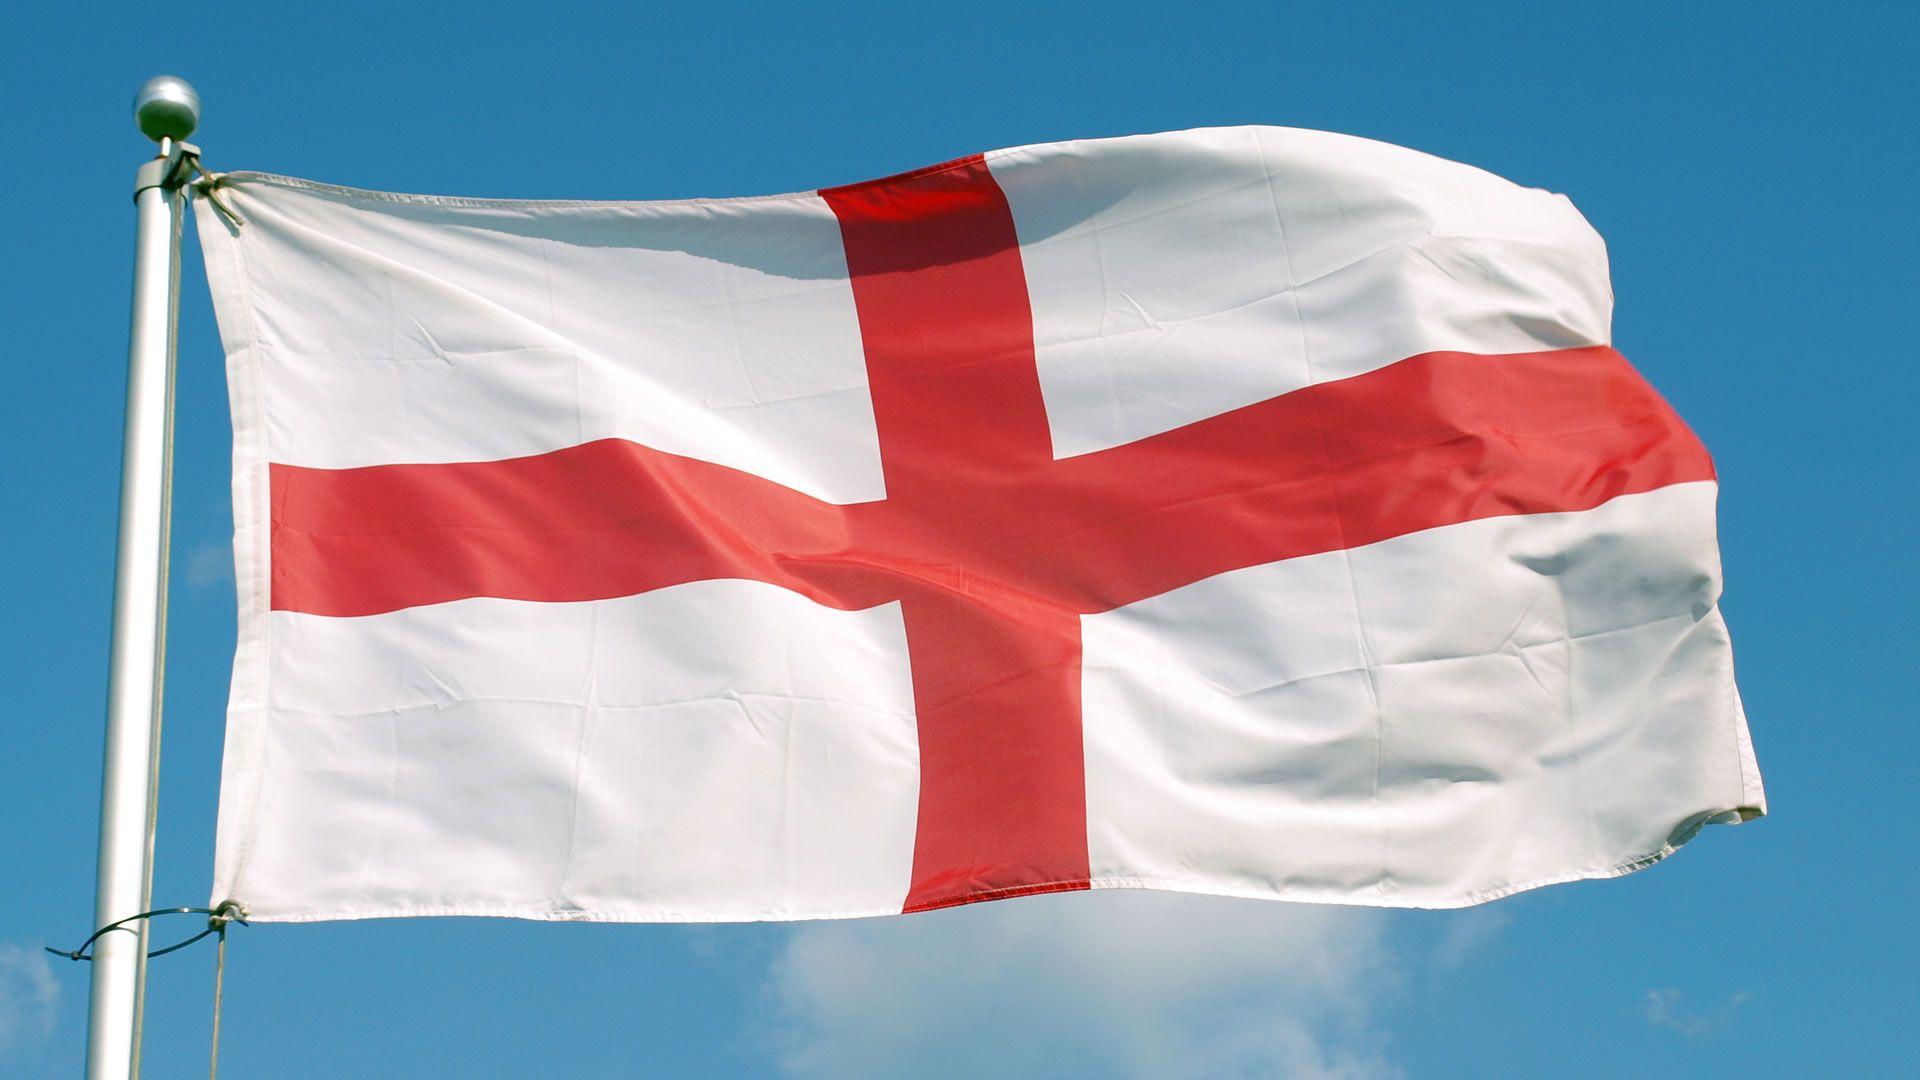 Cruz de San Jorge o Bandera de Inglaterra   Flags of the world ...